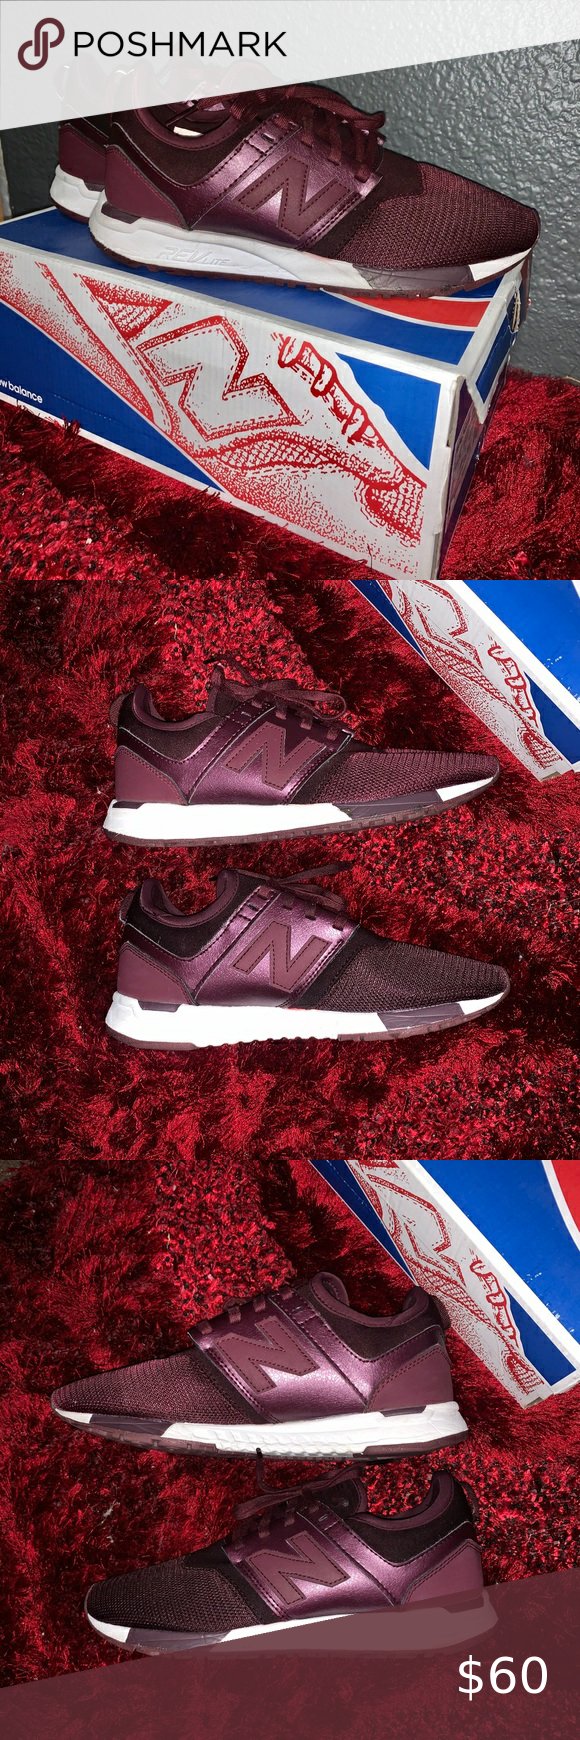 New Balance Maroon LifeStyle Shoes | New balance red, New balance ...